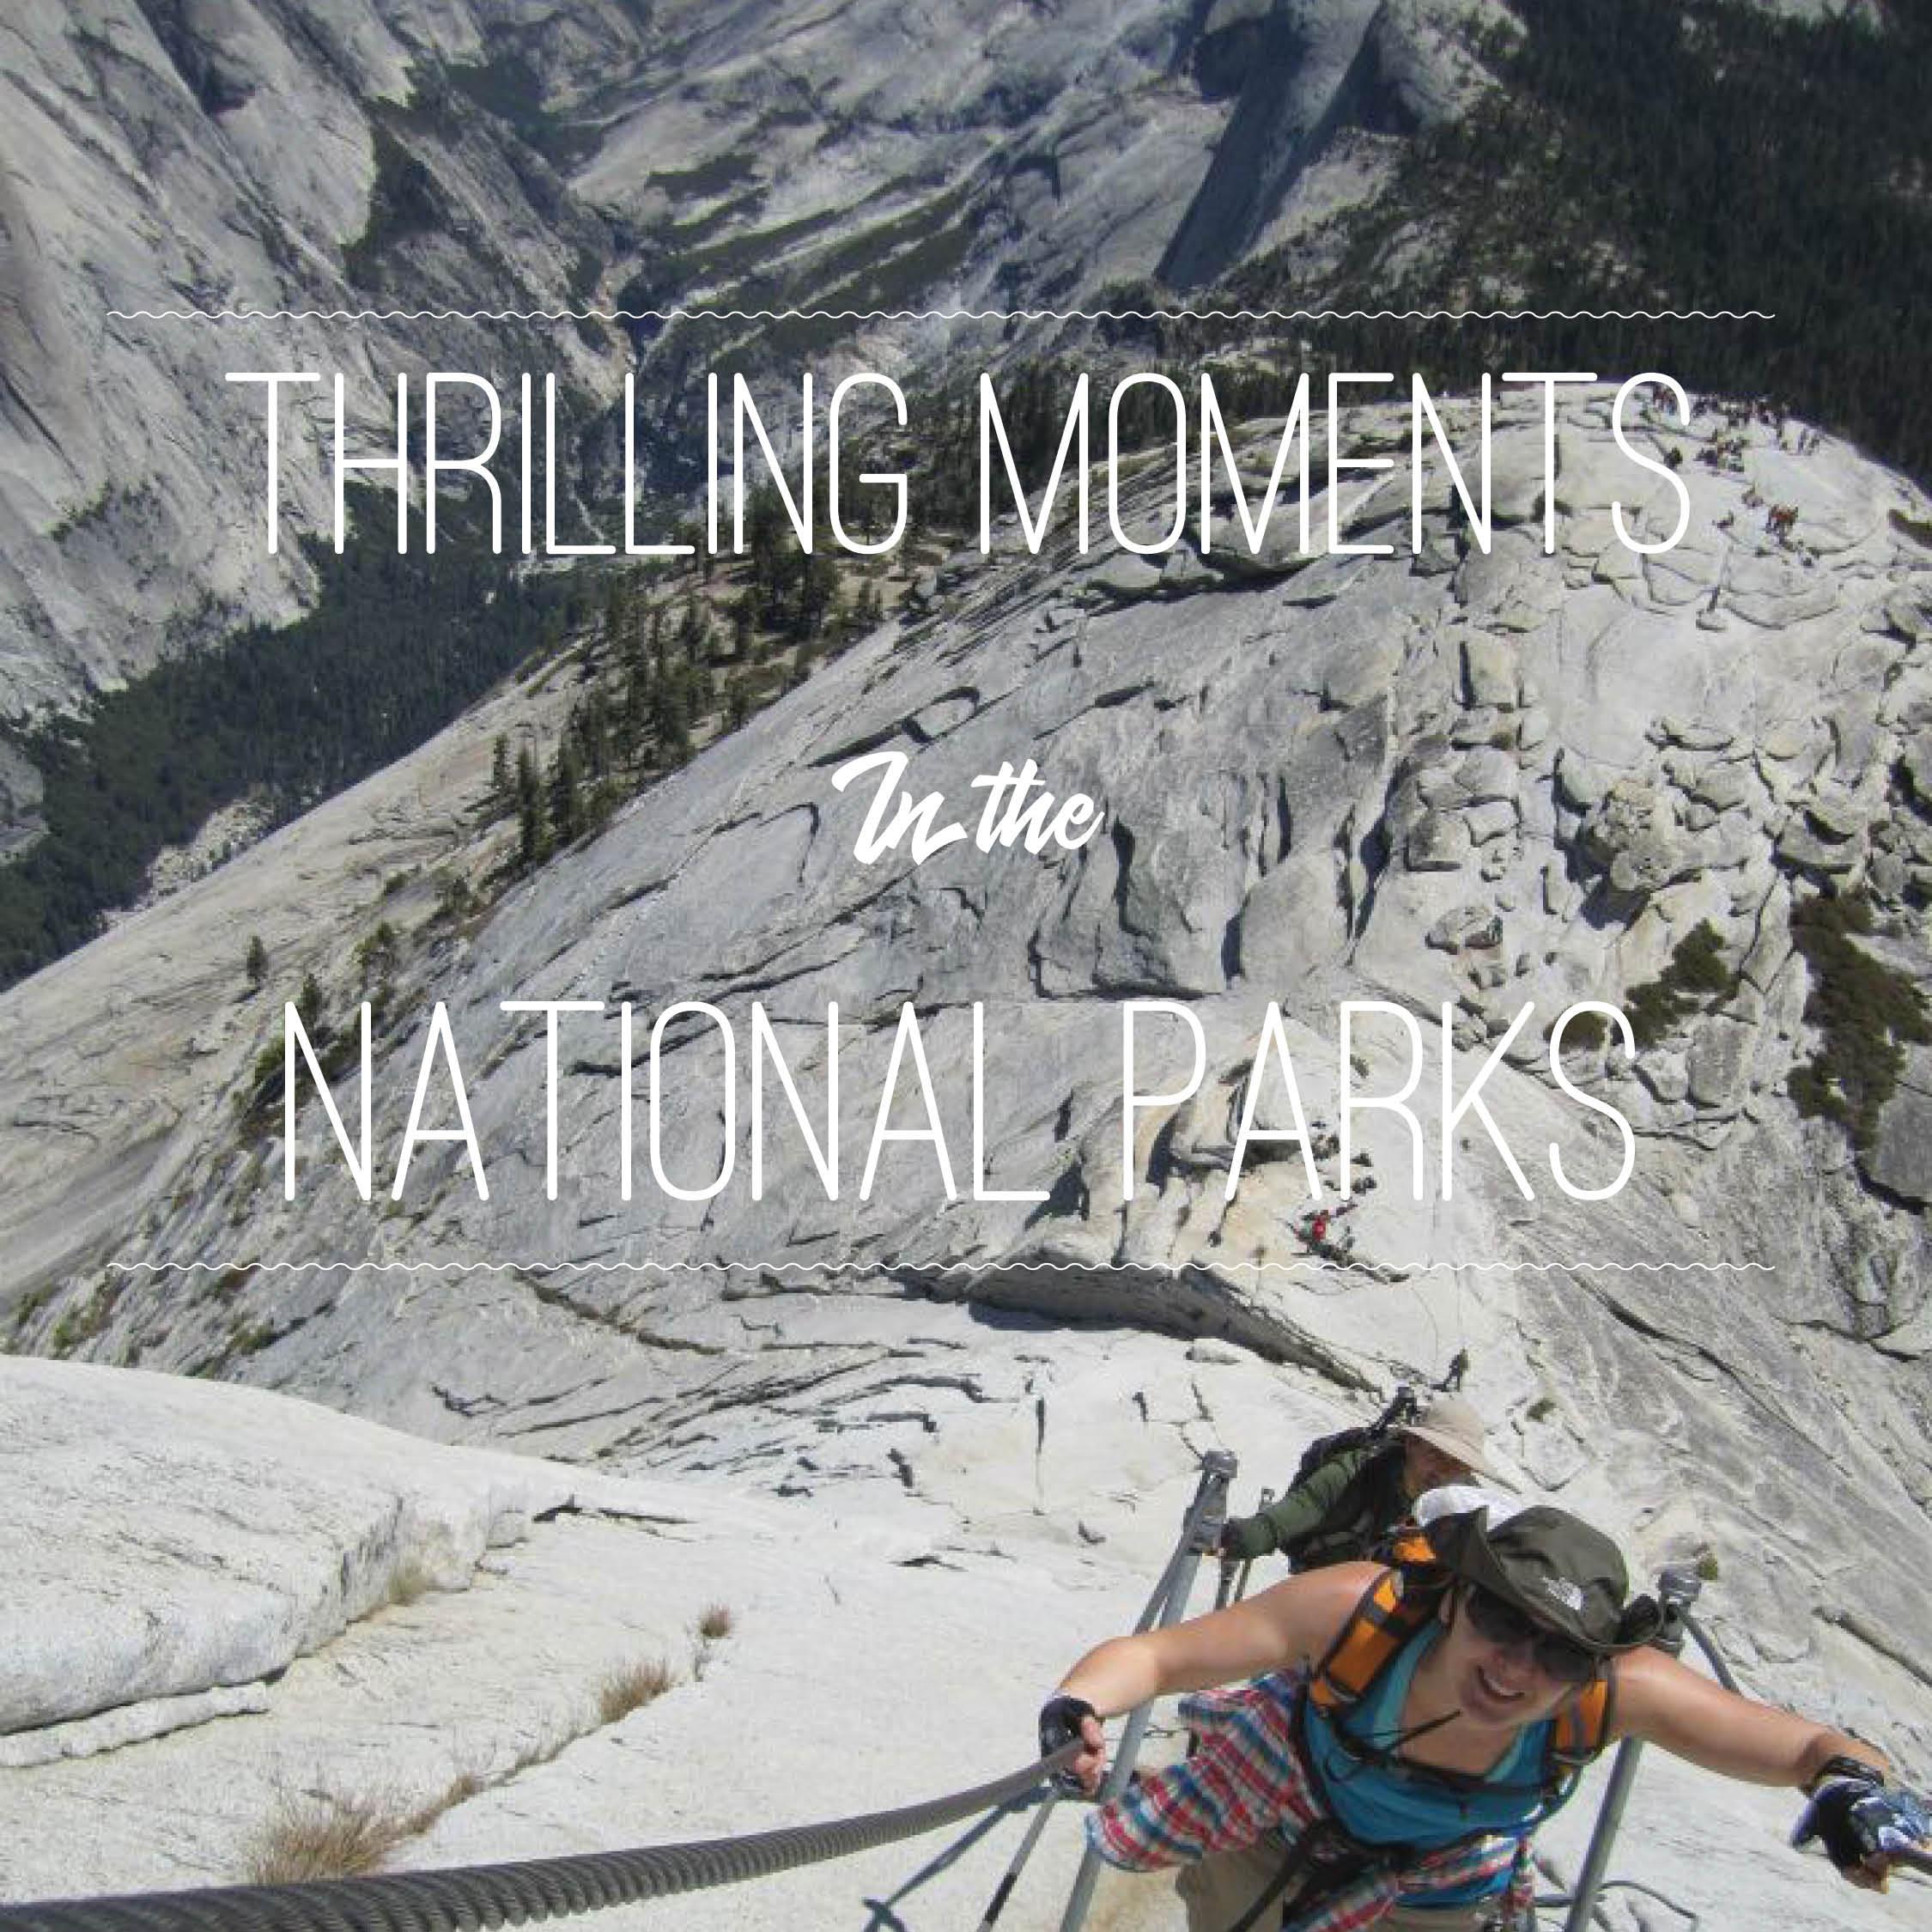 Thrilling Moments.jpg